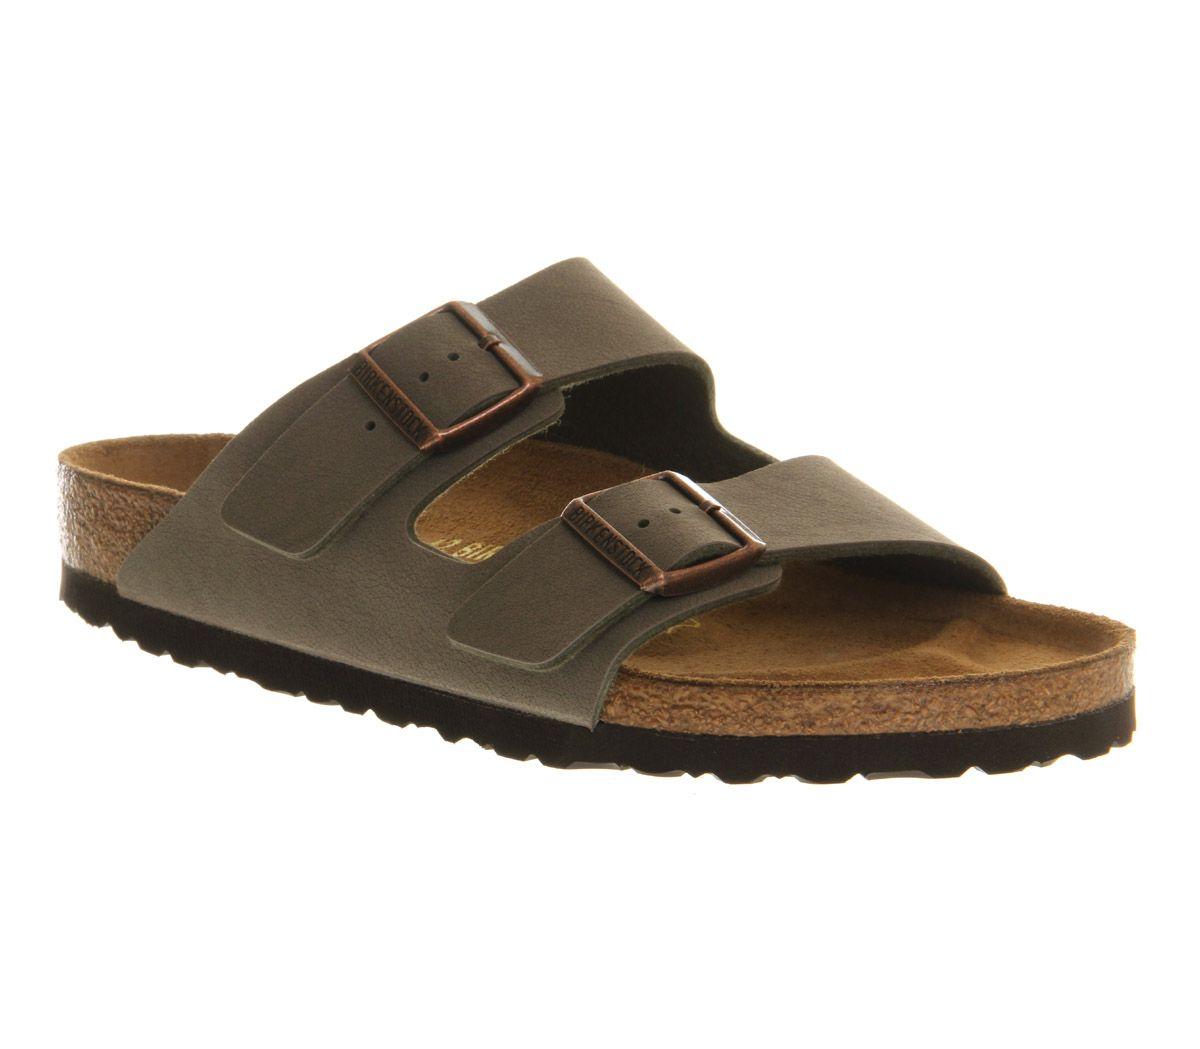 66d2cb175 Birkenstock Arizona Two Strap Sandals Stone - Sandals